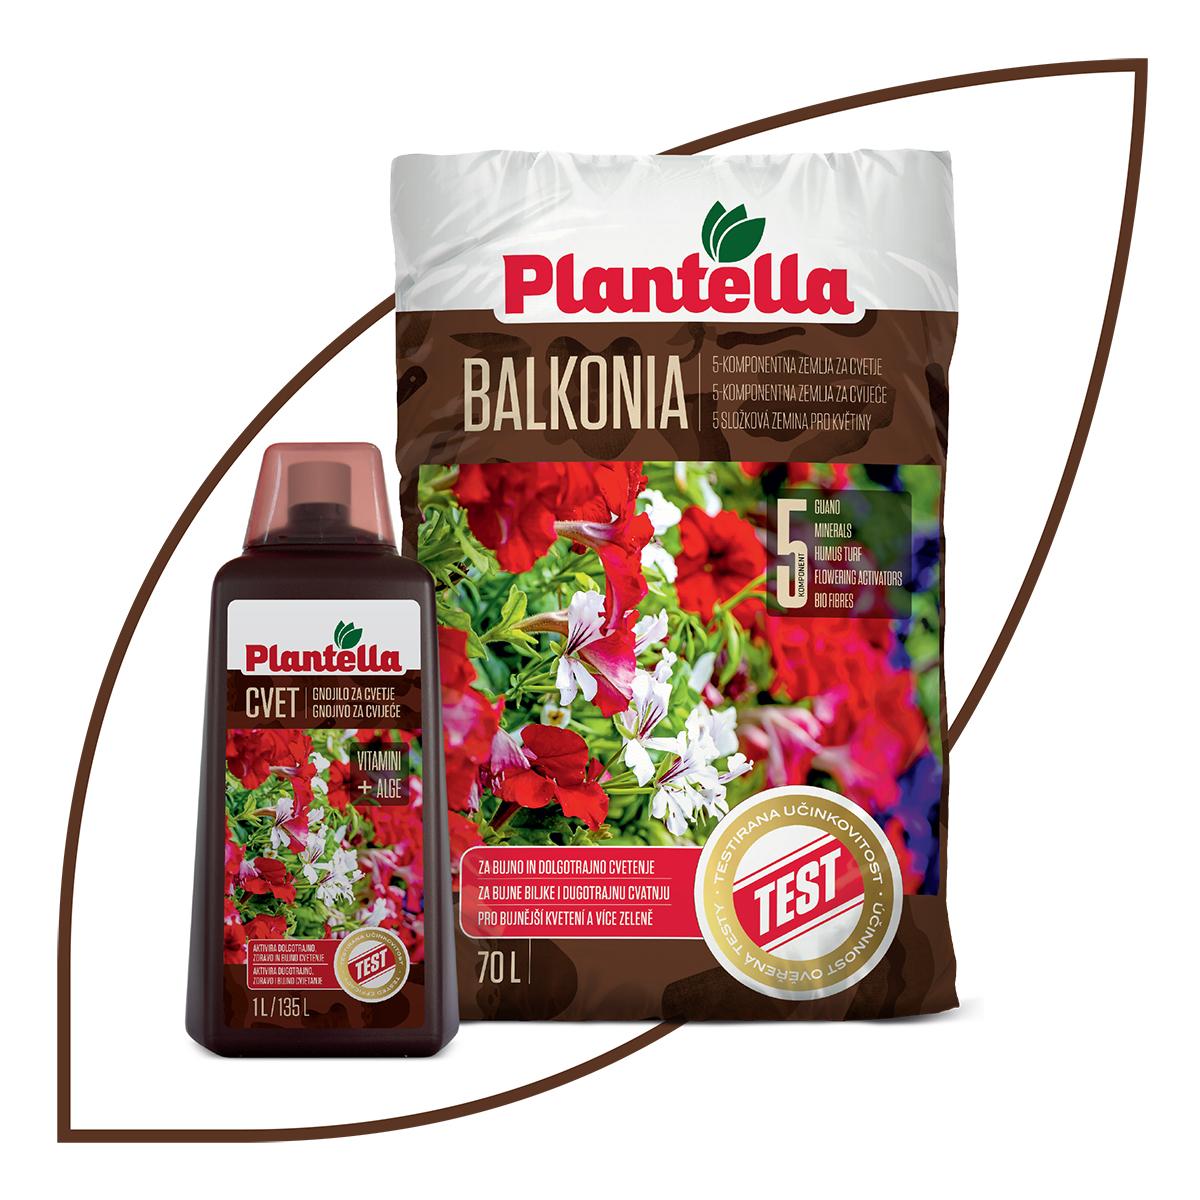 plantella-Balkonia-cvet-domnakvadrat